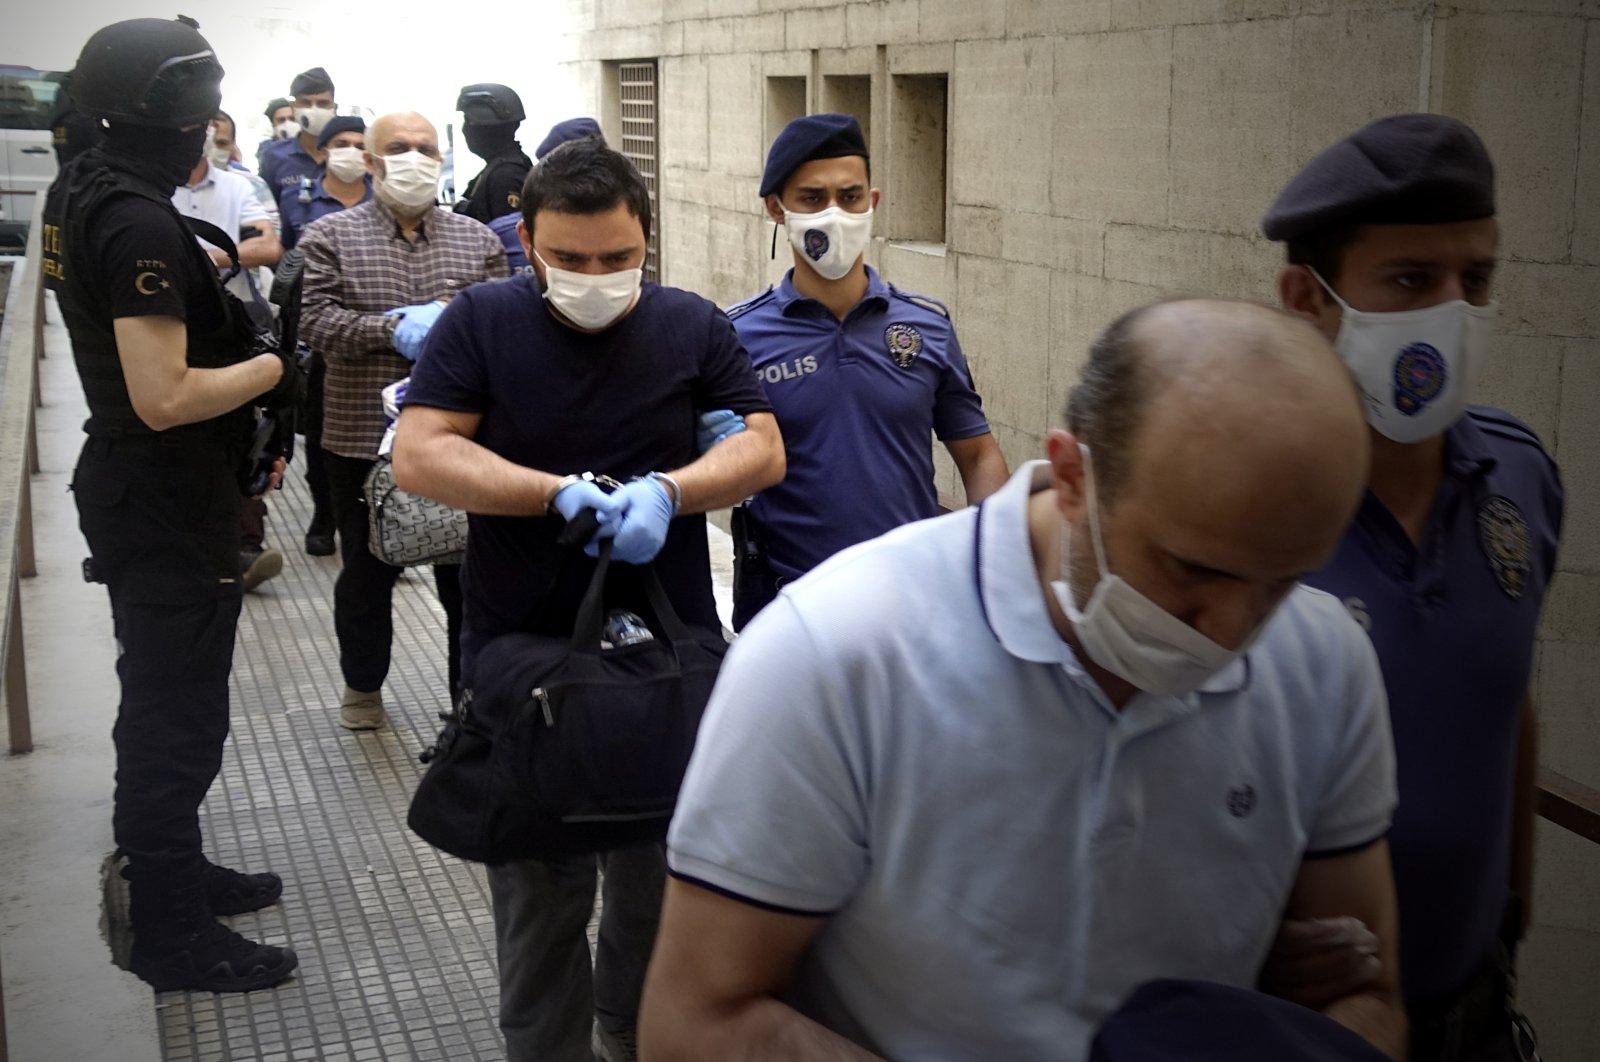 Police escort the FETÖ suspects to a courthouse, Bursa, Turkey, June 7, 2020. (AA Photo)